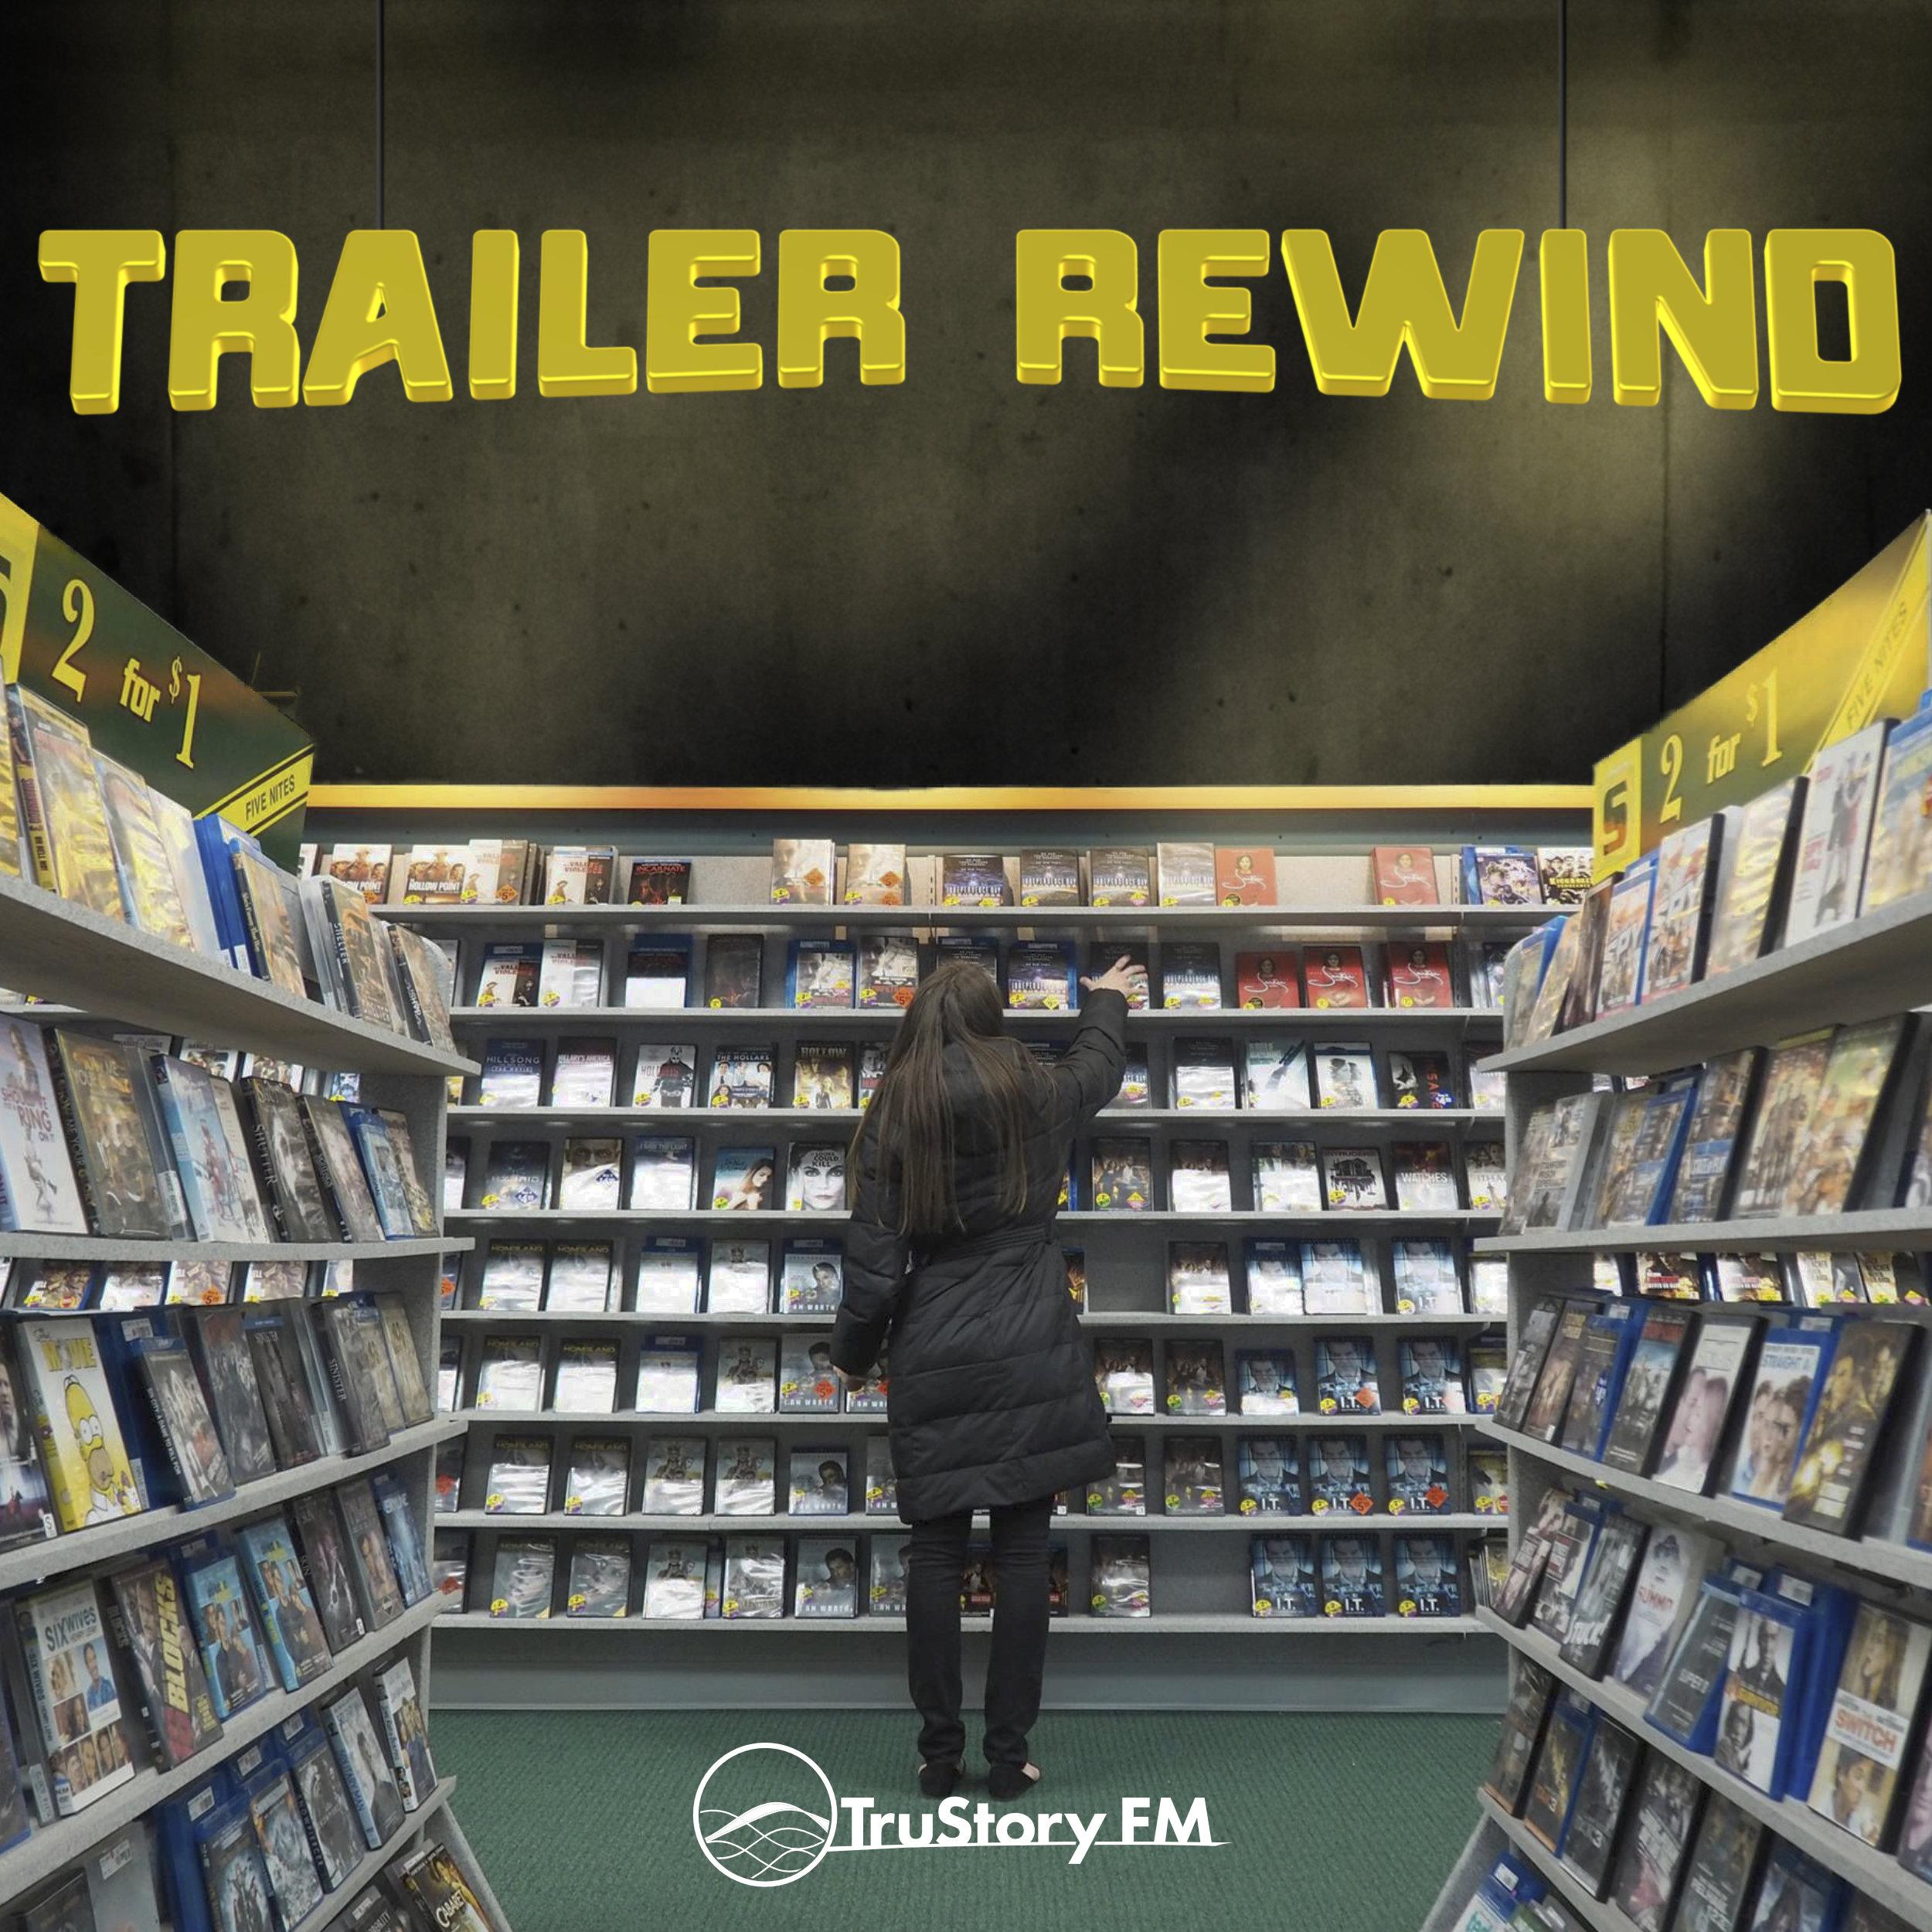 Trailer Rewind Thumb